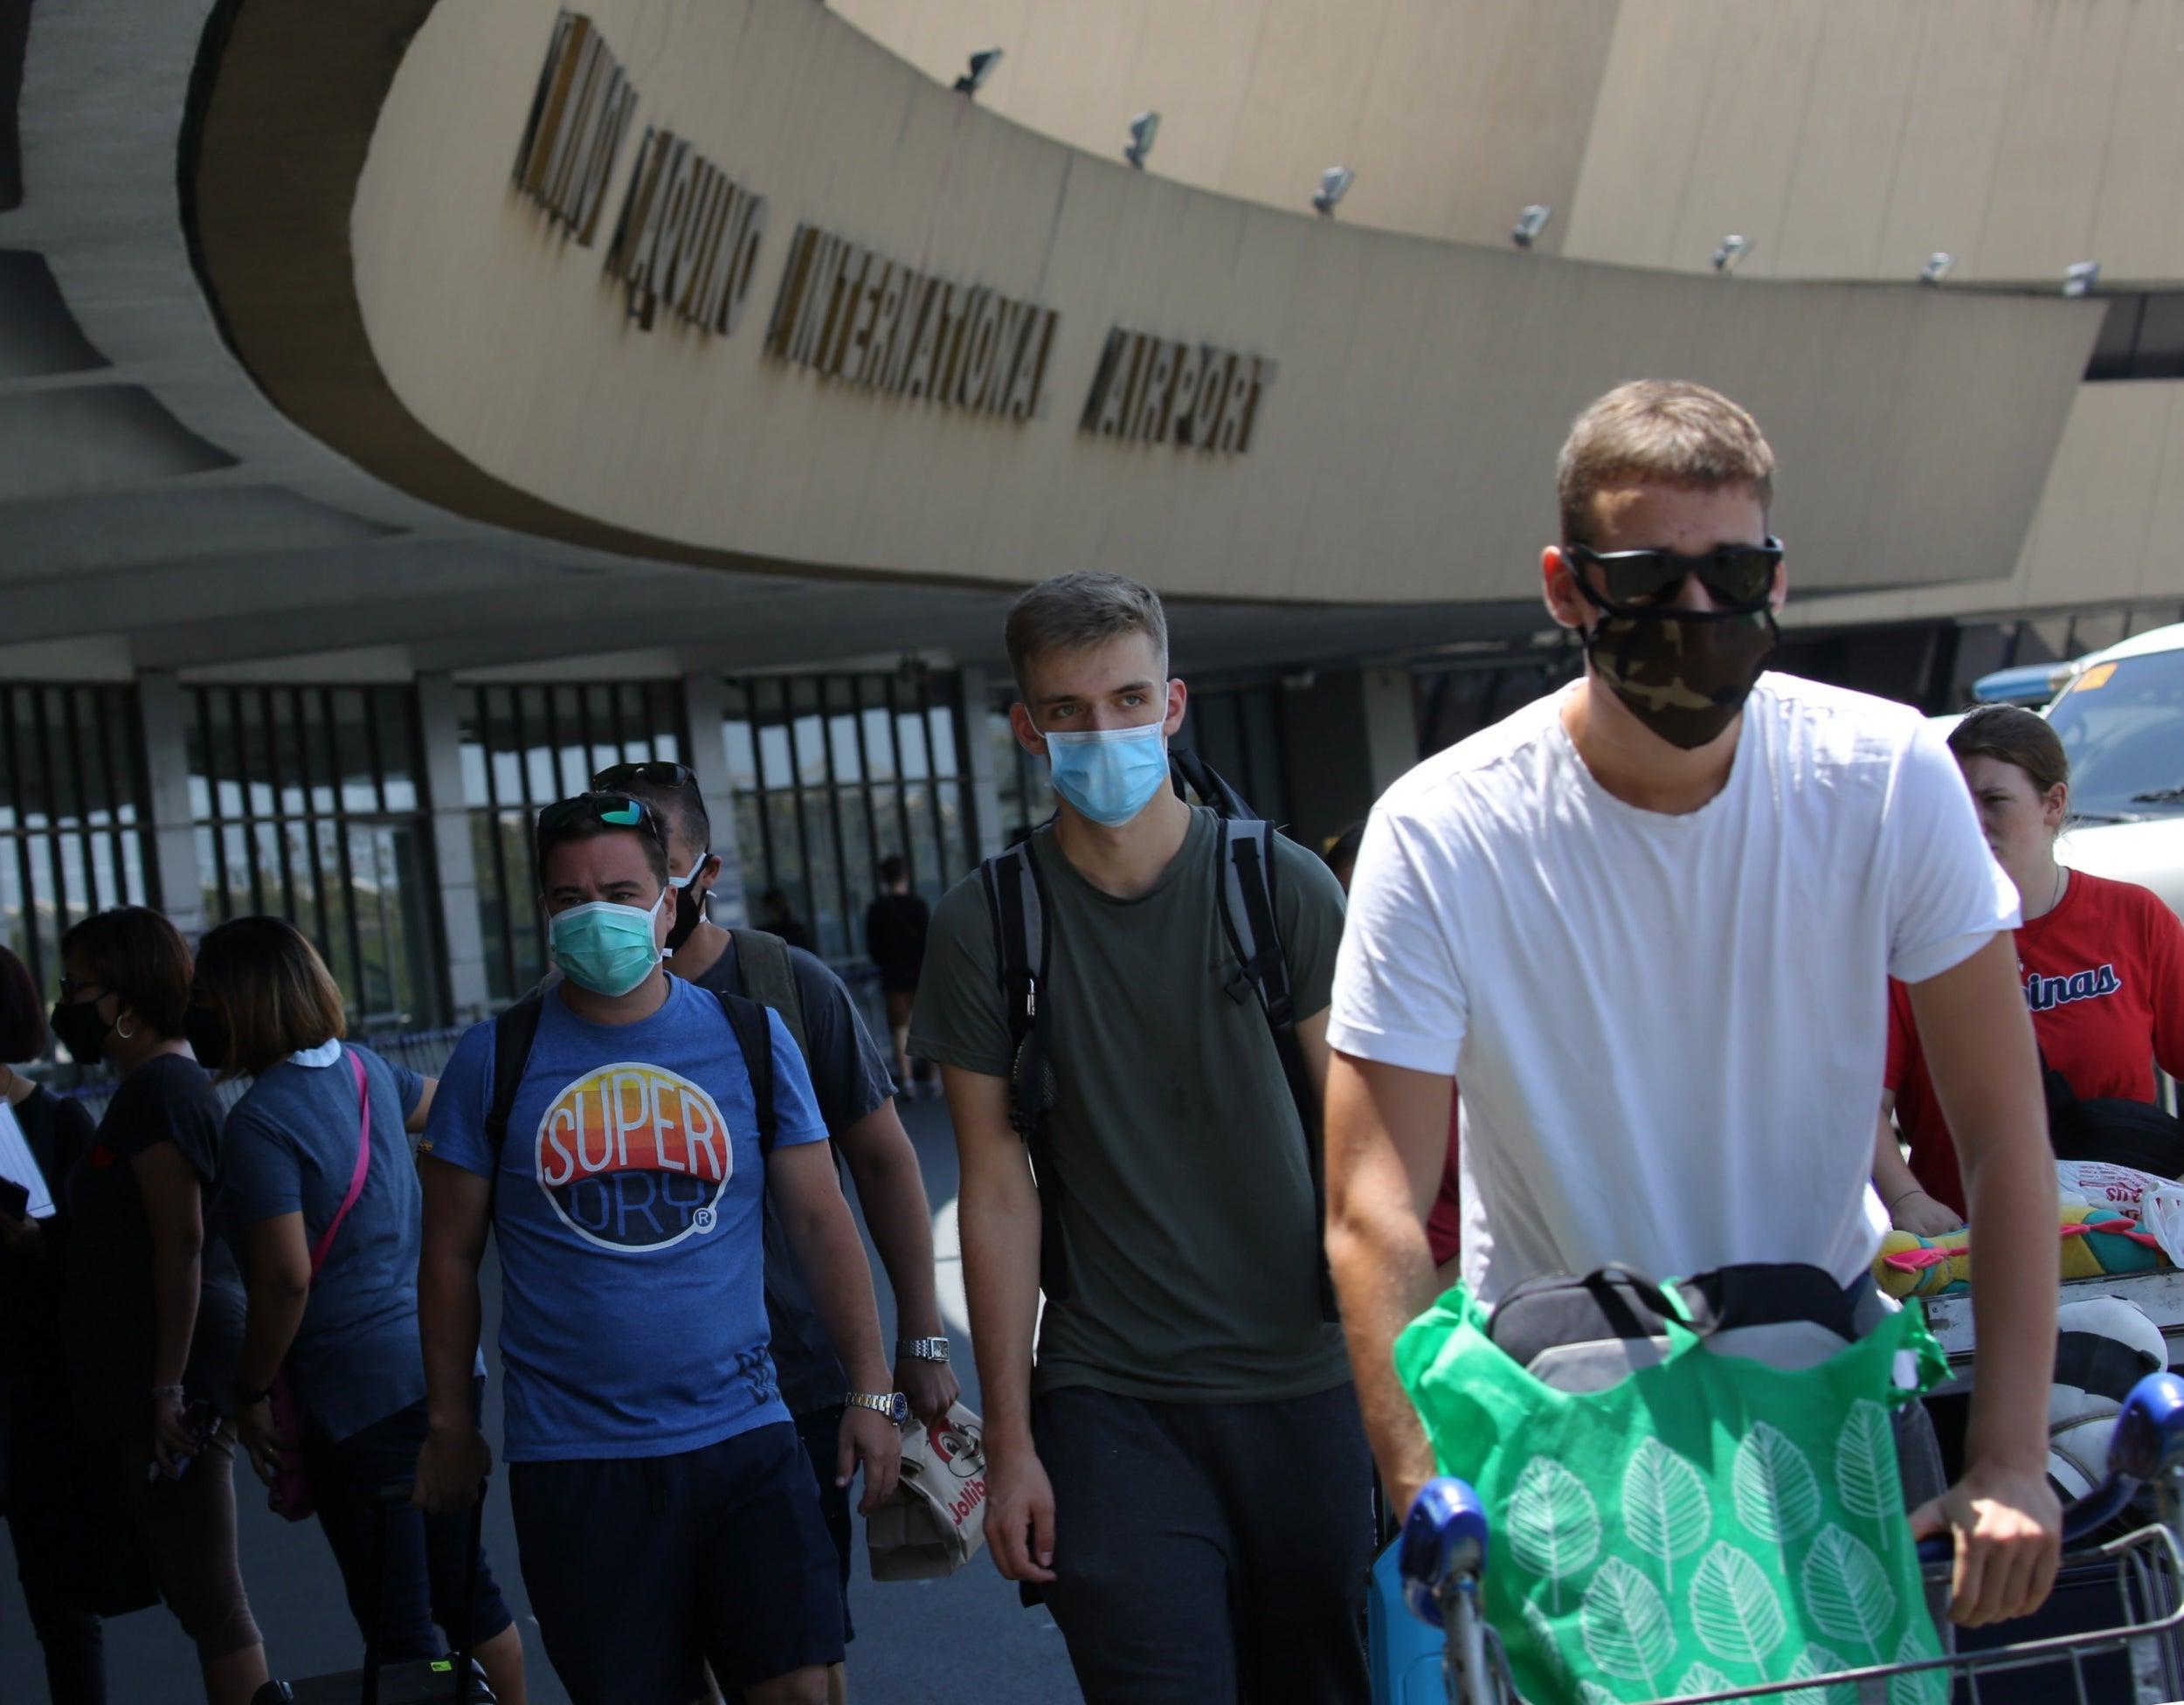 UK travellers furious at £1,000 repatriation flights from Philippines amid coronavirus crisis